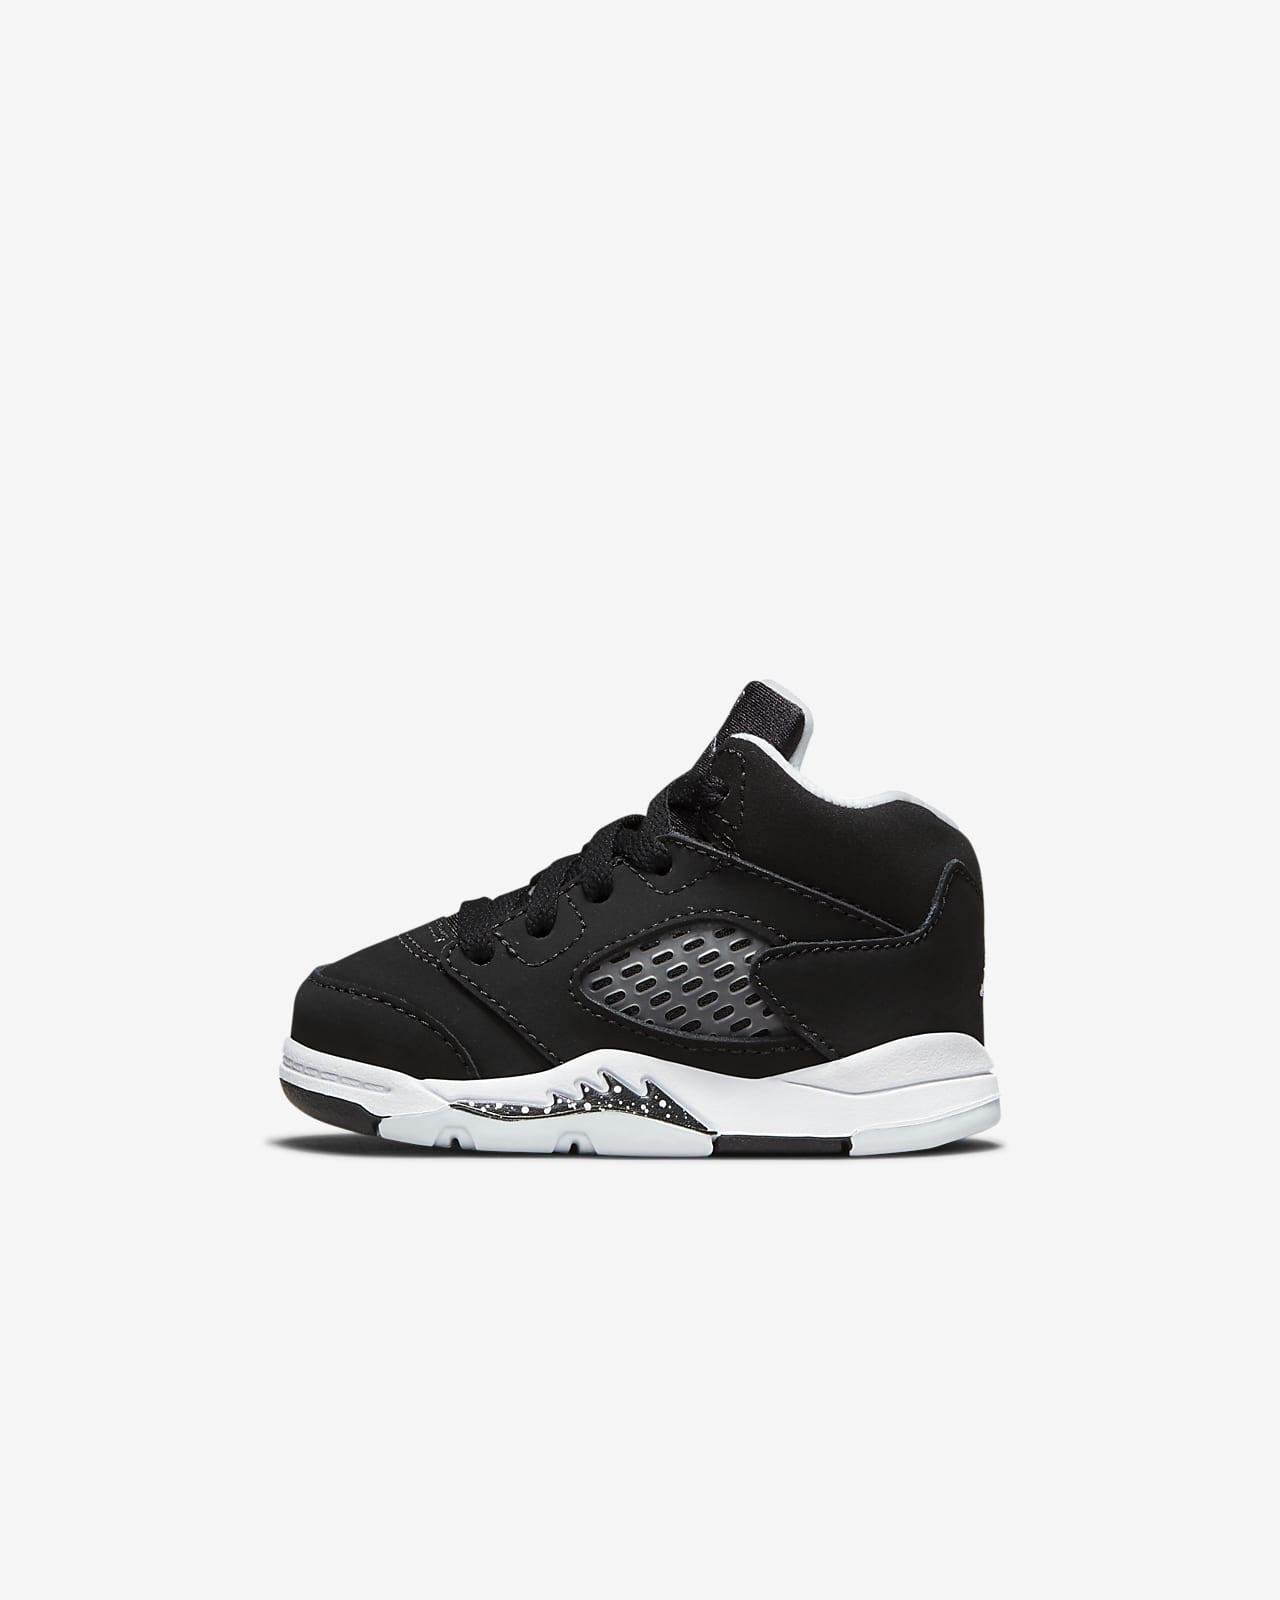 Jordan 5 Retro Infant/Toddler Shoe